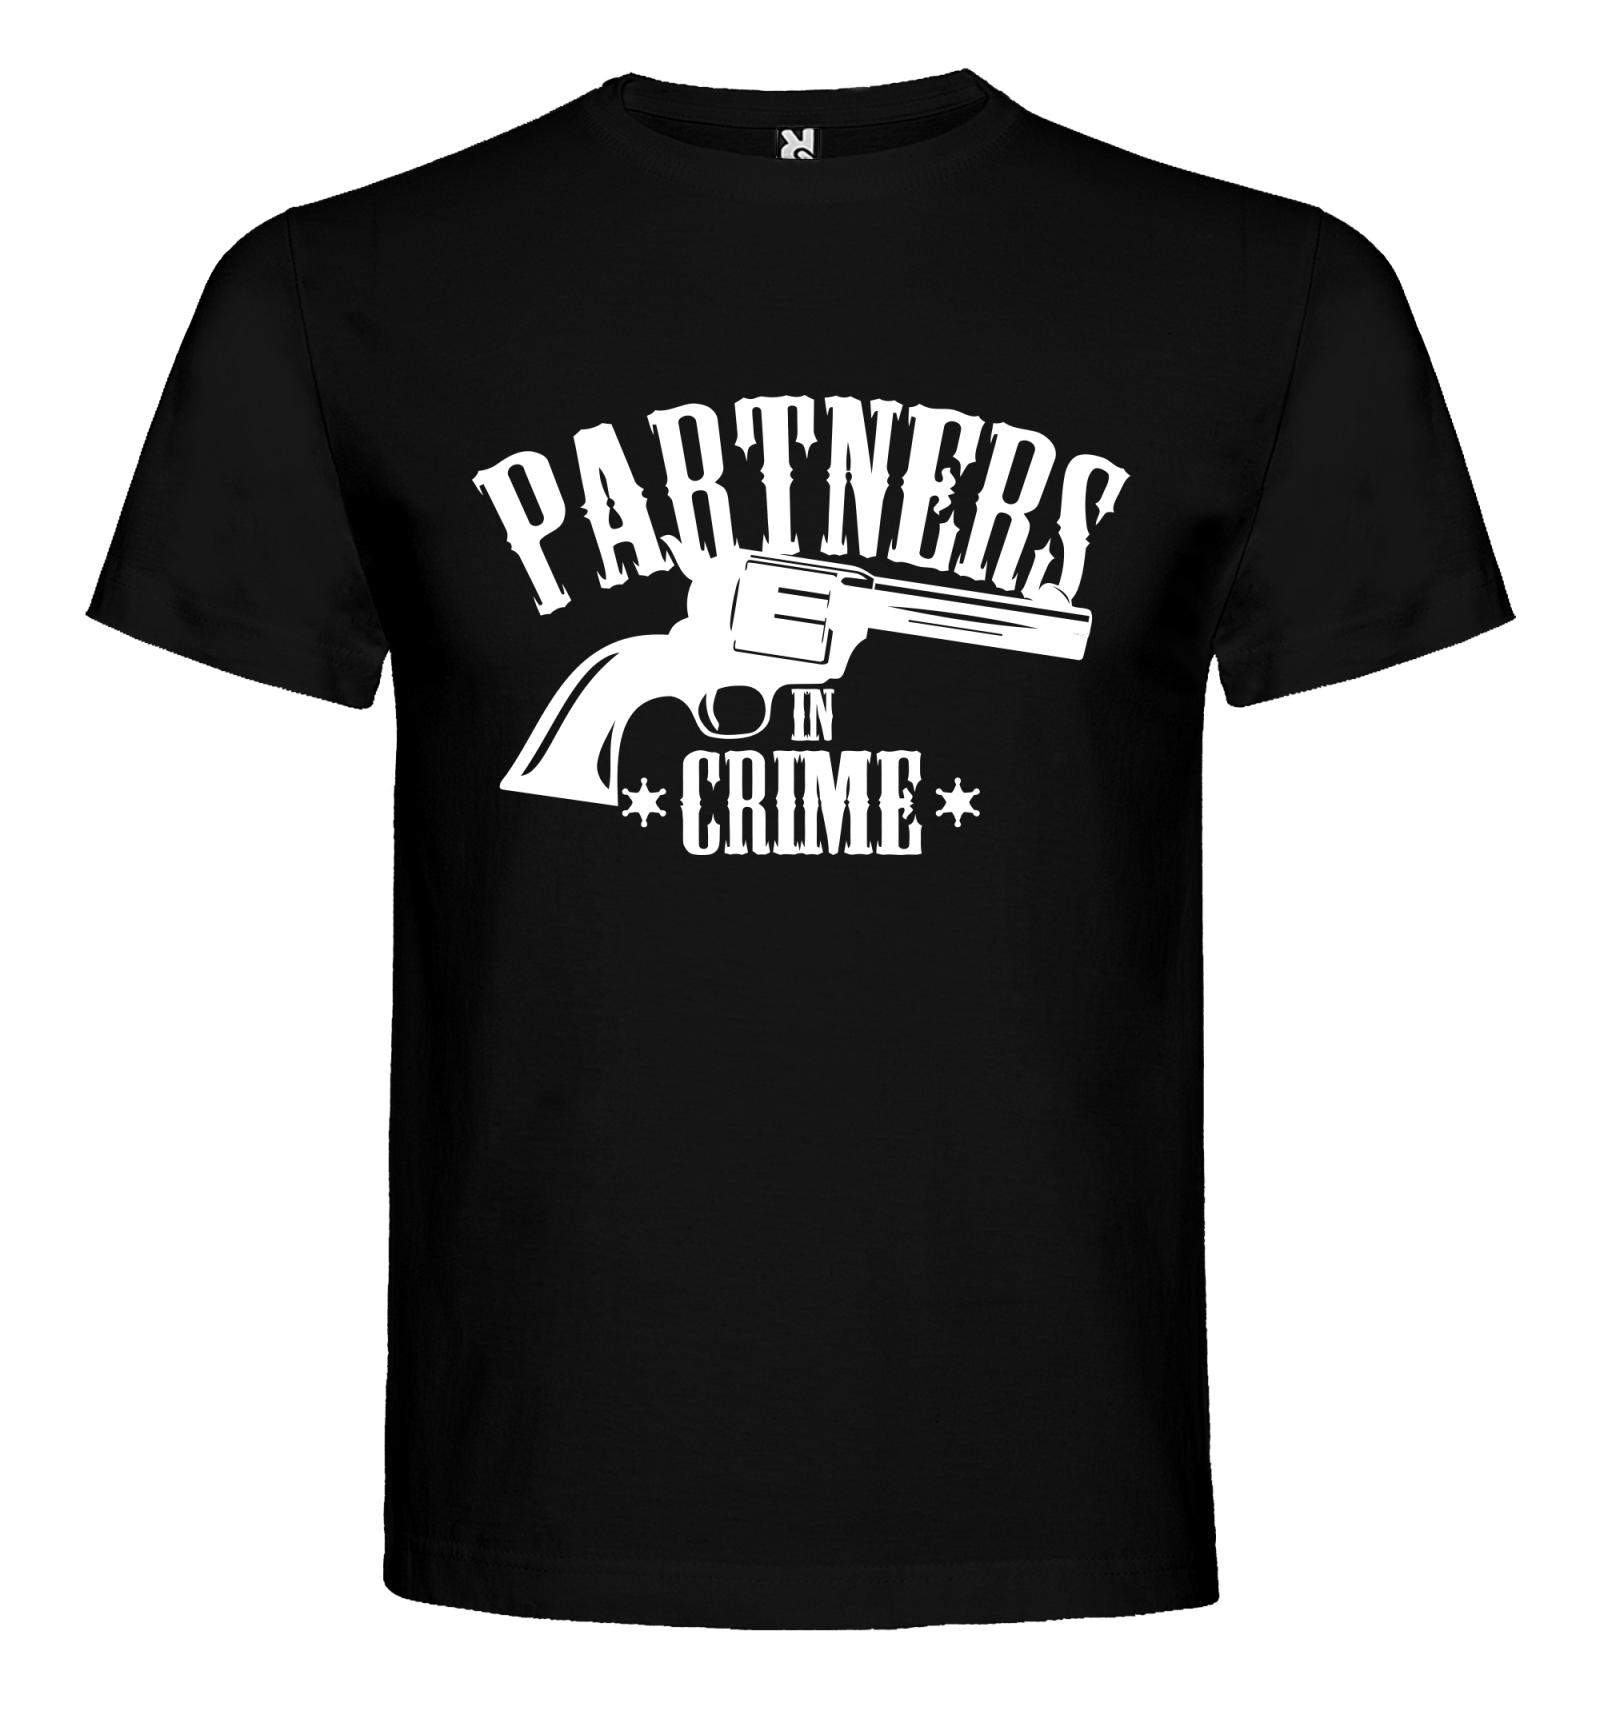 842ec5f79d0 Trička pro páry PARTNERS IN CRIME - BVTRIKO